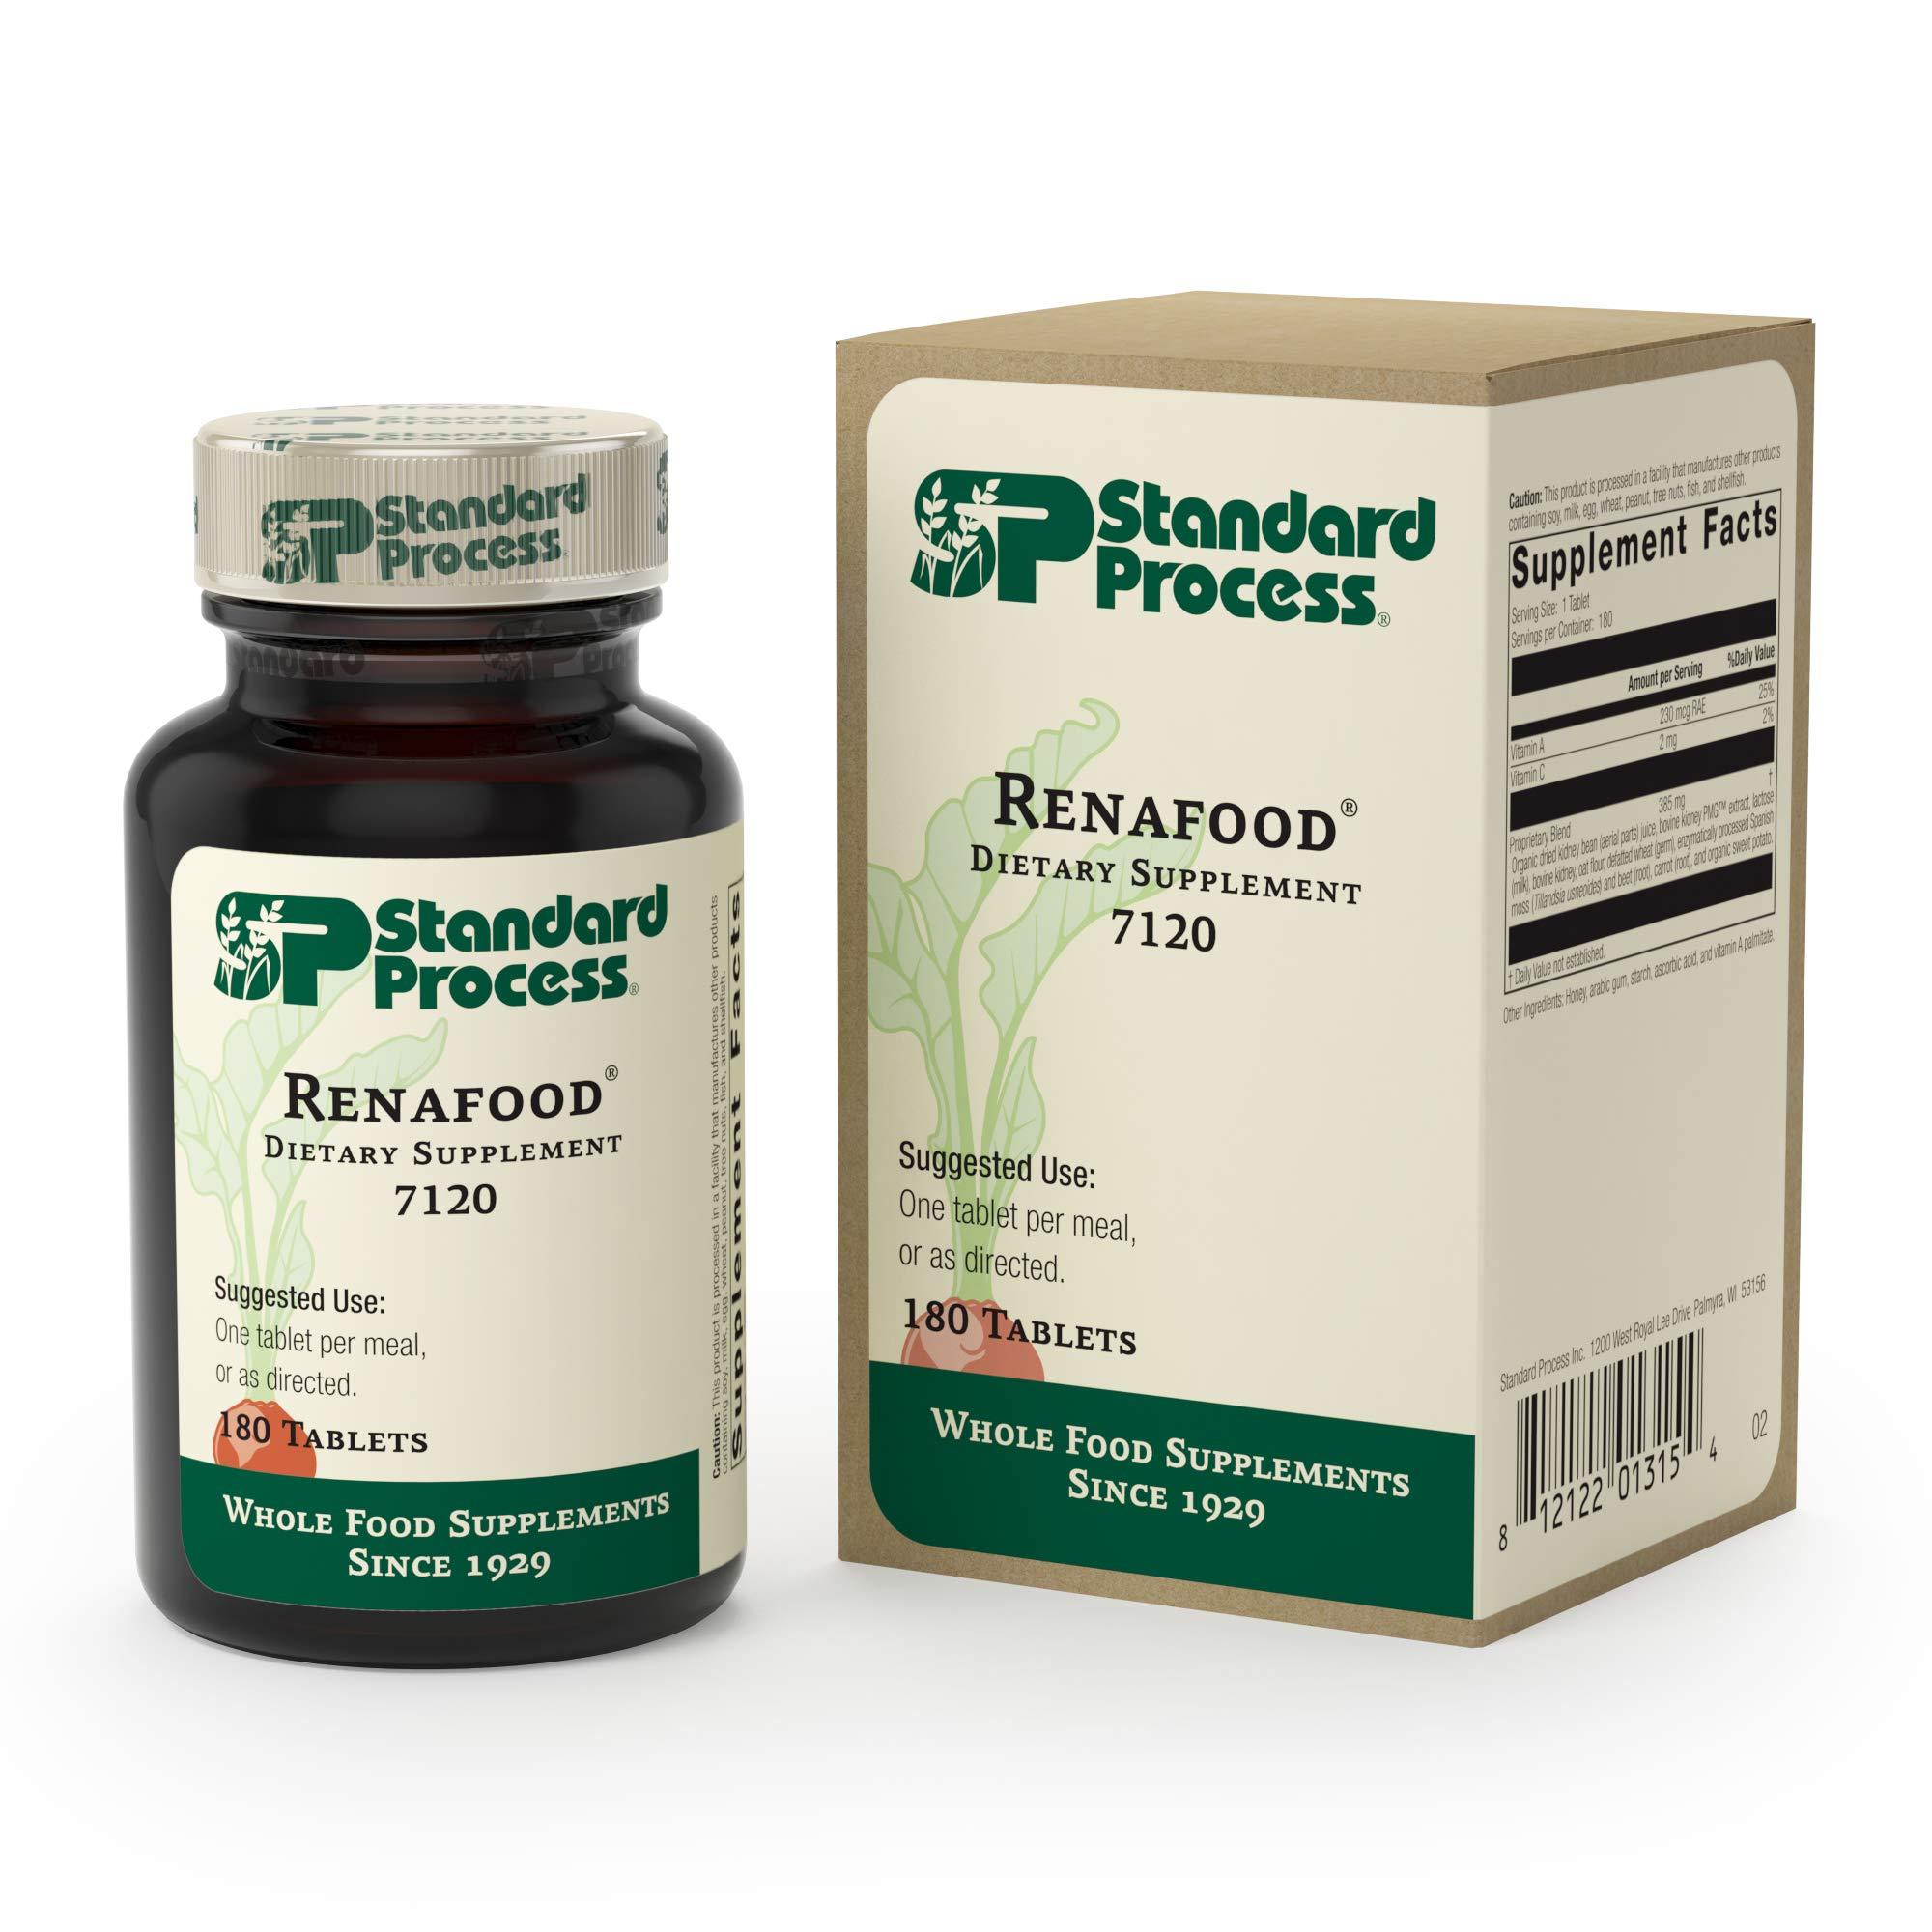 Amazon.com: Standard Process - Arginex - 990 IU Vitamin A, Gluten ...